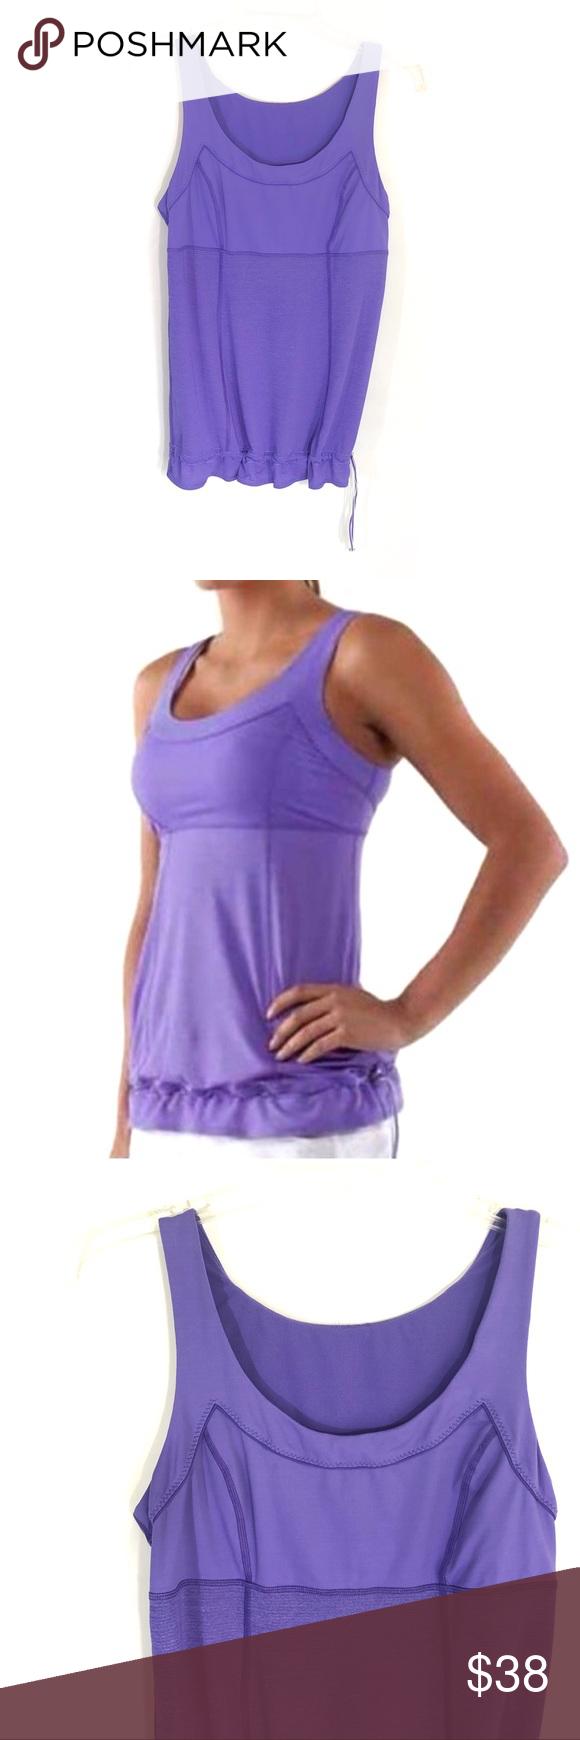 Lululemon Purple Run Tame Me Workout Tank Size 8 Clothes Design Athletic Tank Tops Workout Tanks